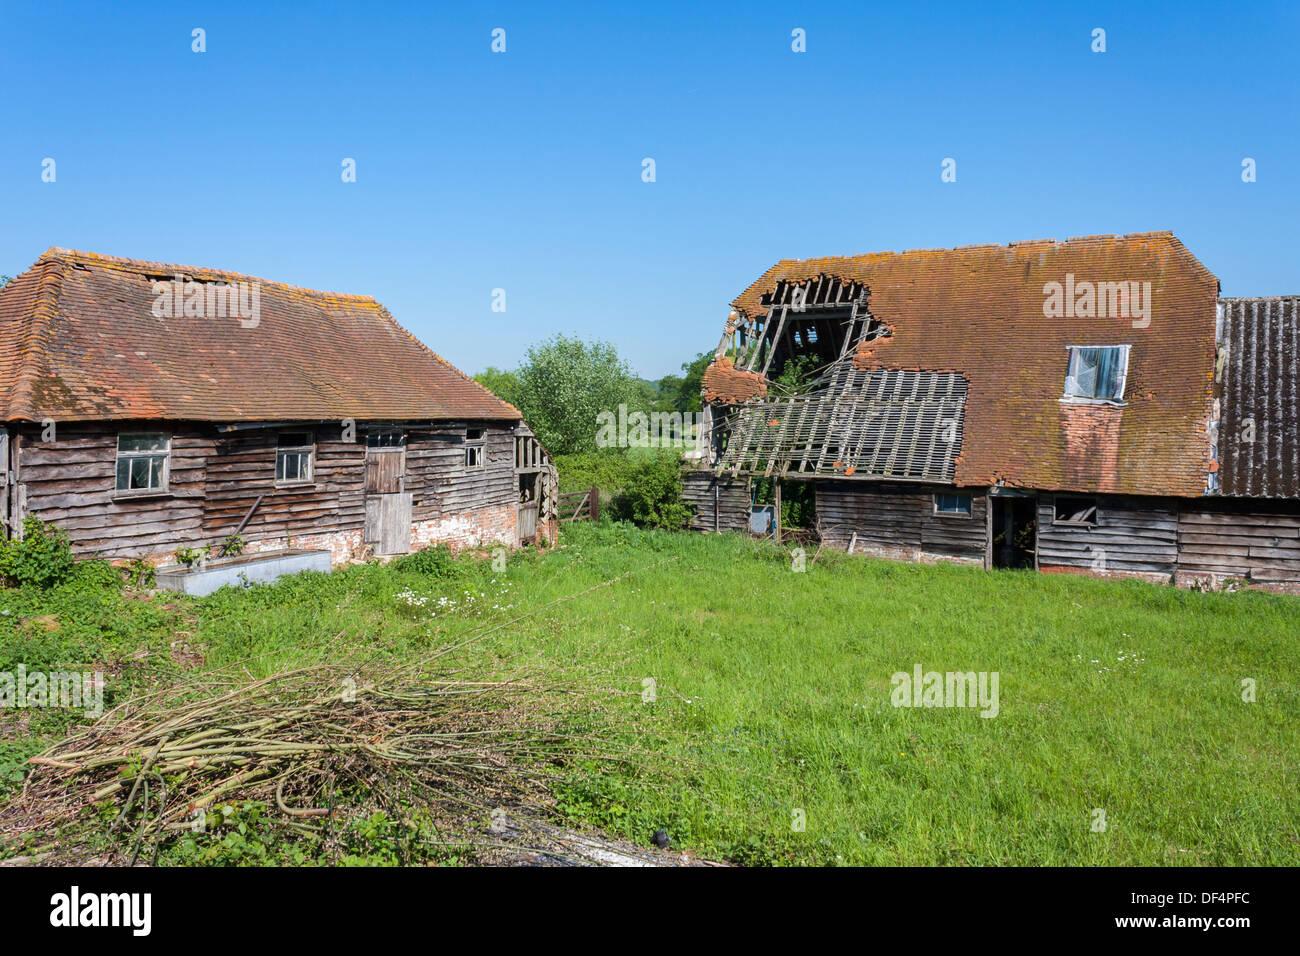 Old decrepit buildings in a rural English farmyard, Bucklebury, Berkshire, England, GB, UK. - Stock Image